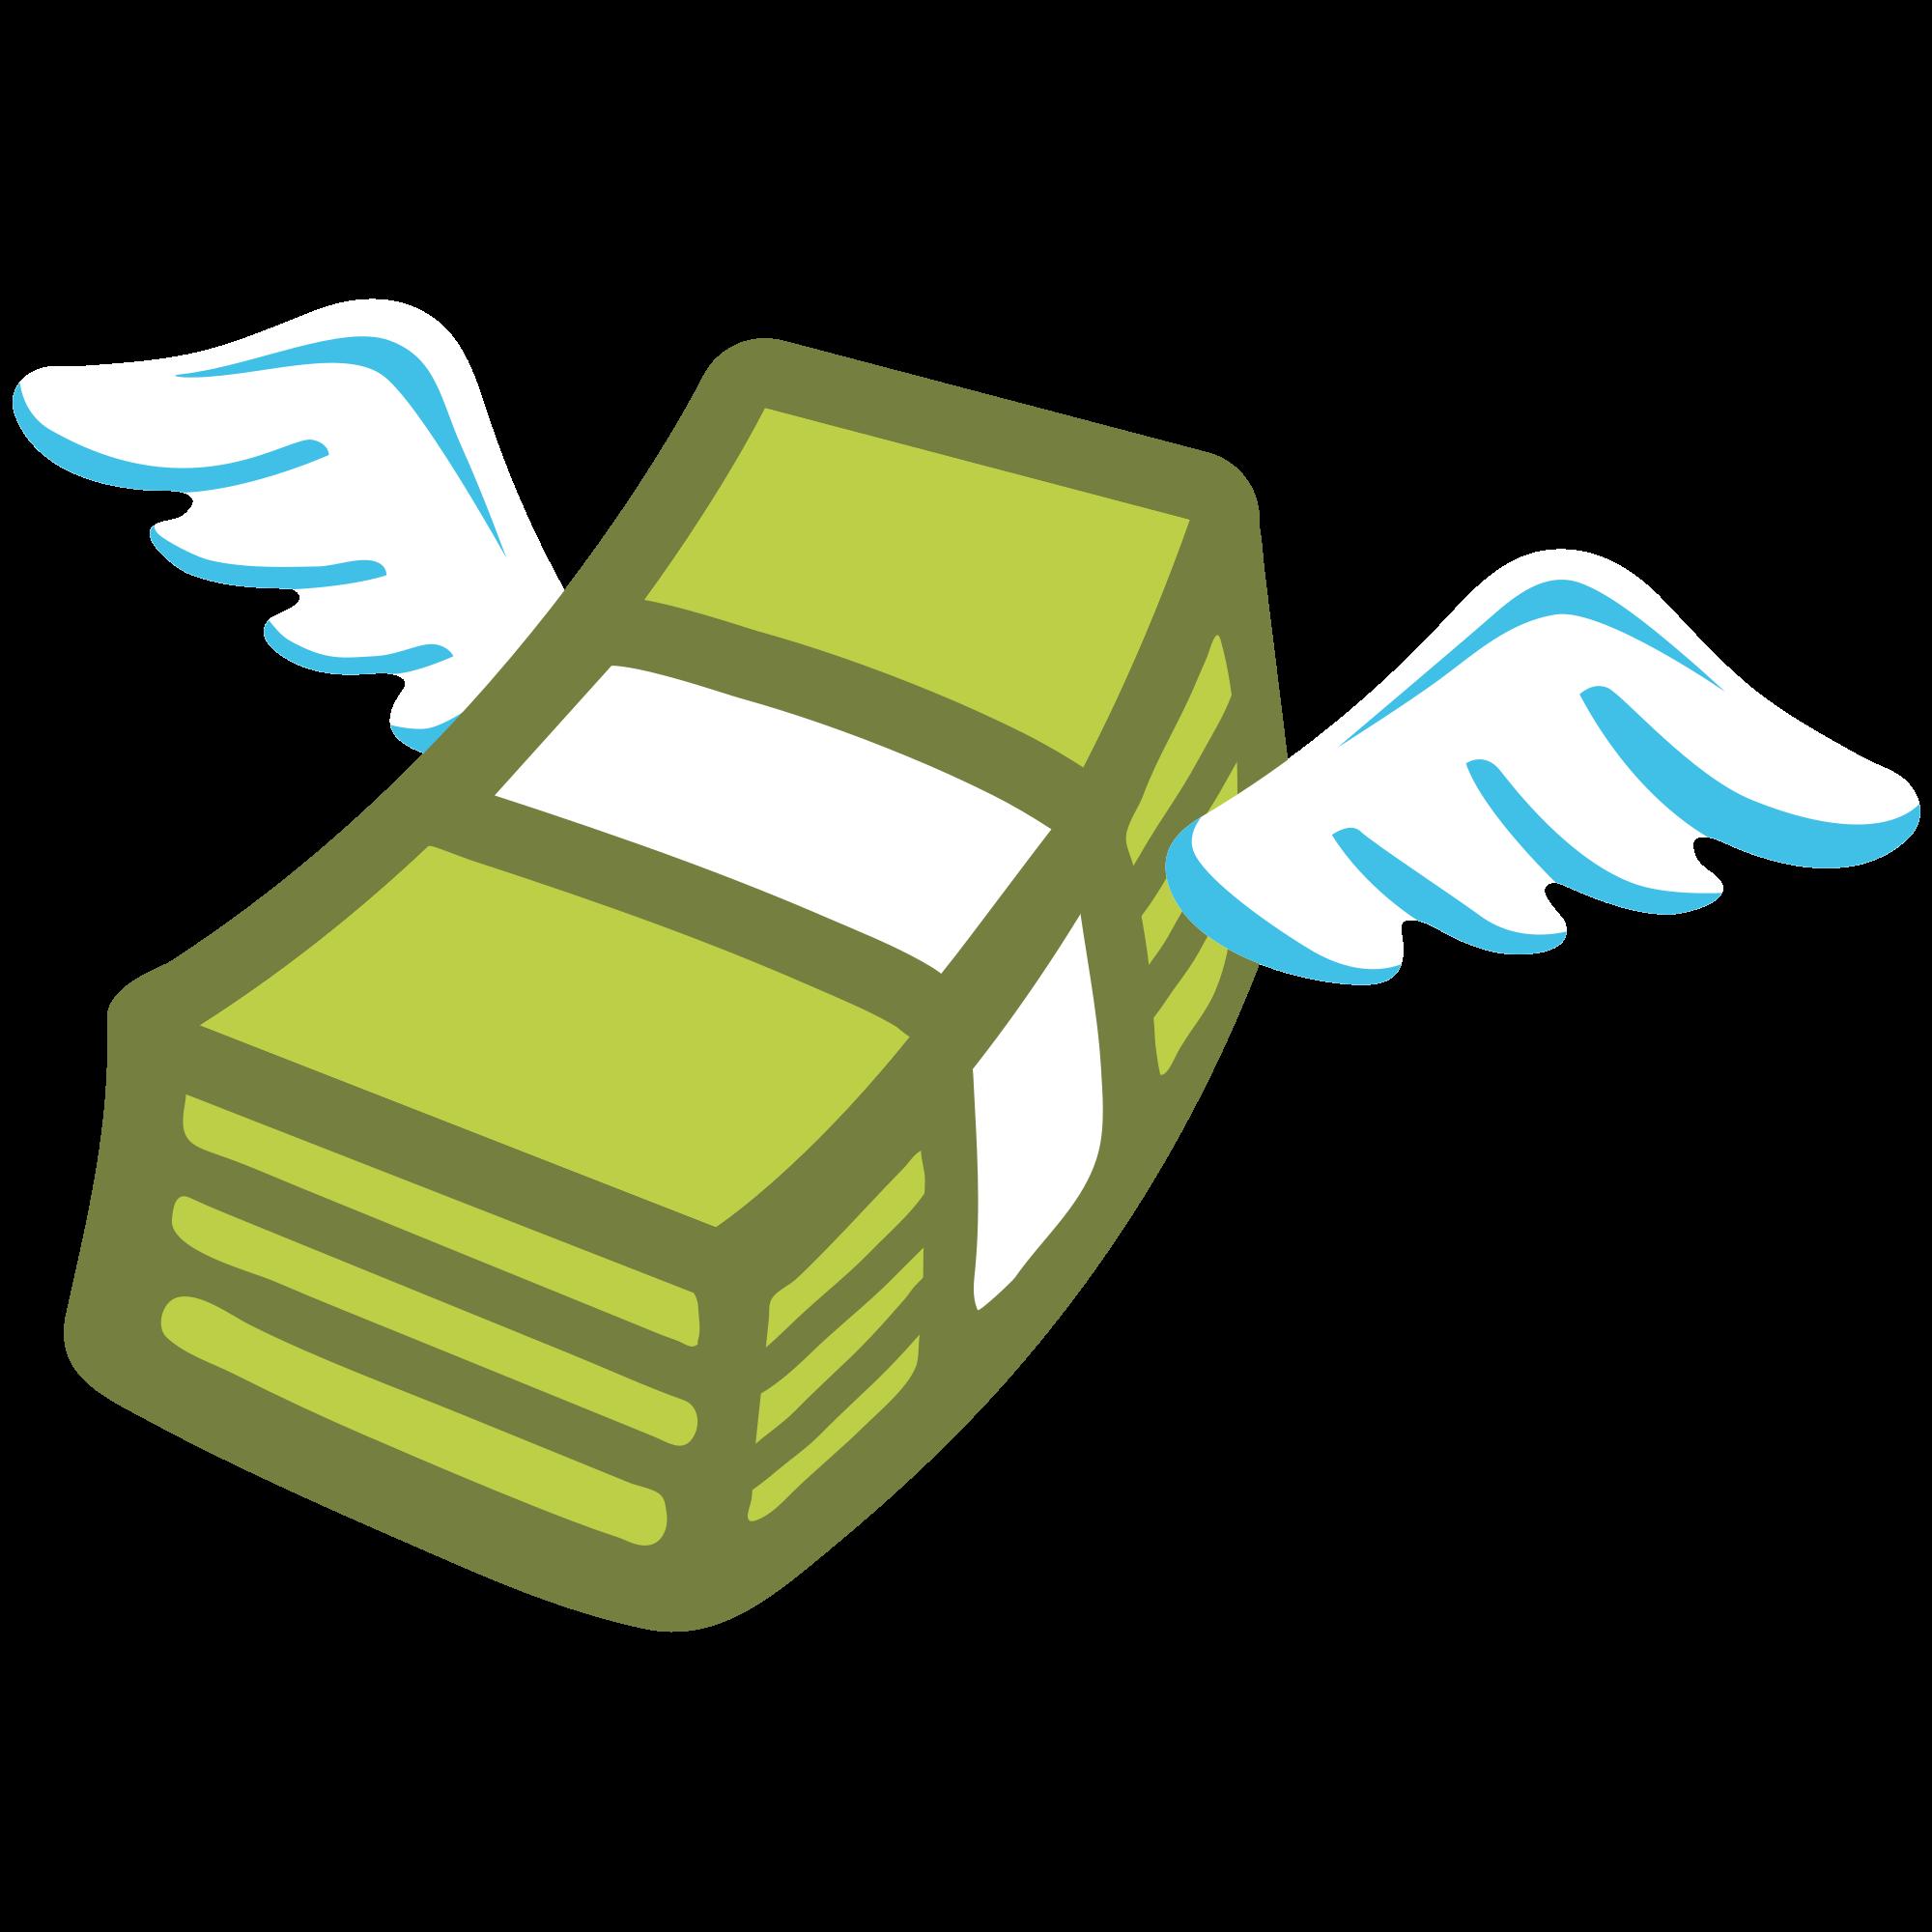 Free money emoji clipart vector royalty free library File:Emoji u1f4b8.svg - Wikimedia Commons vector royalty free library